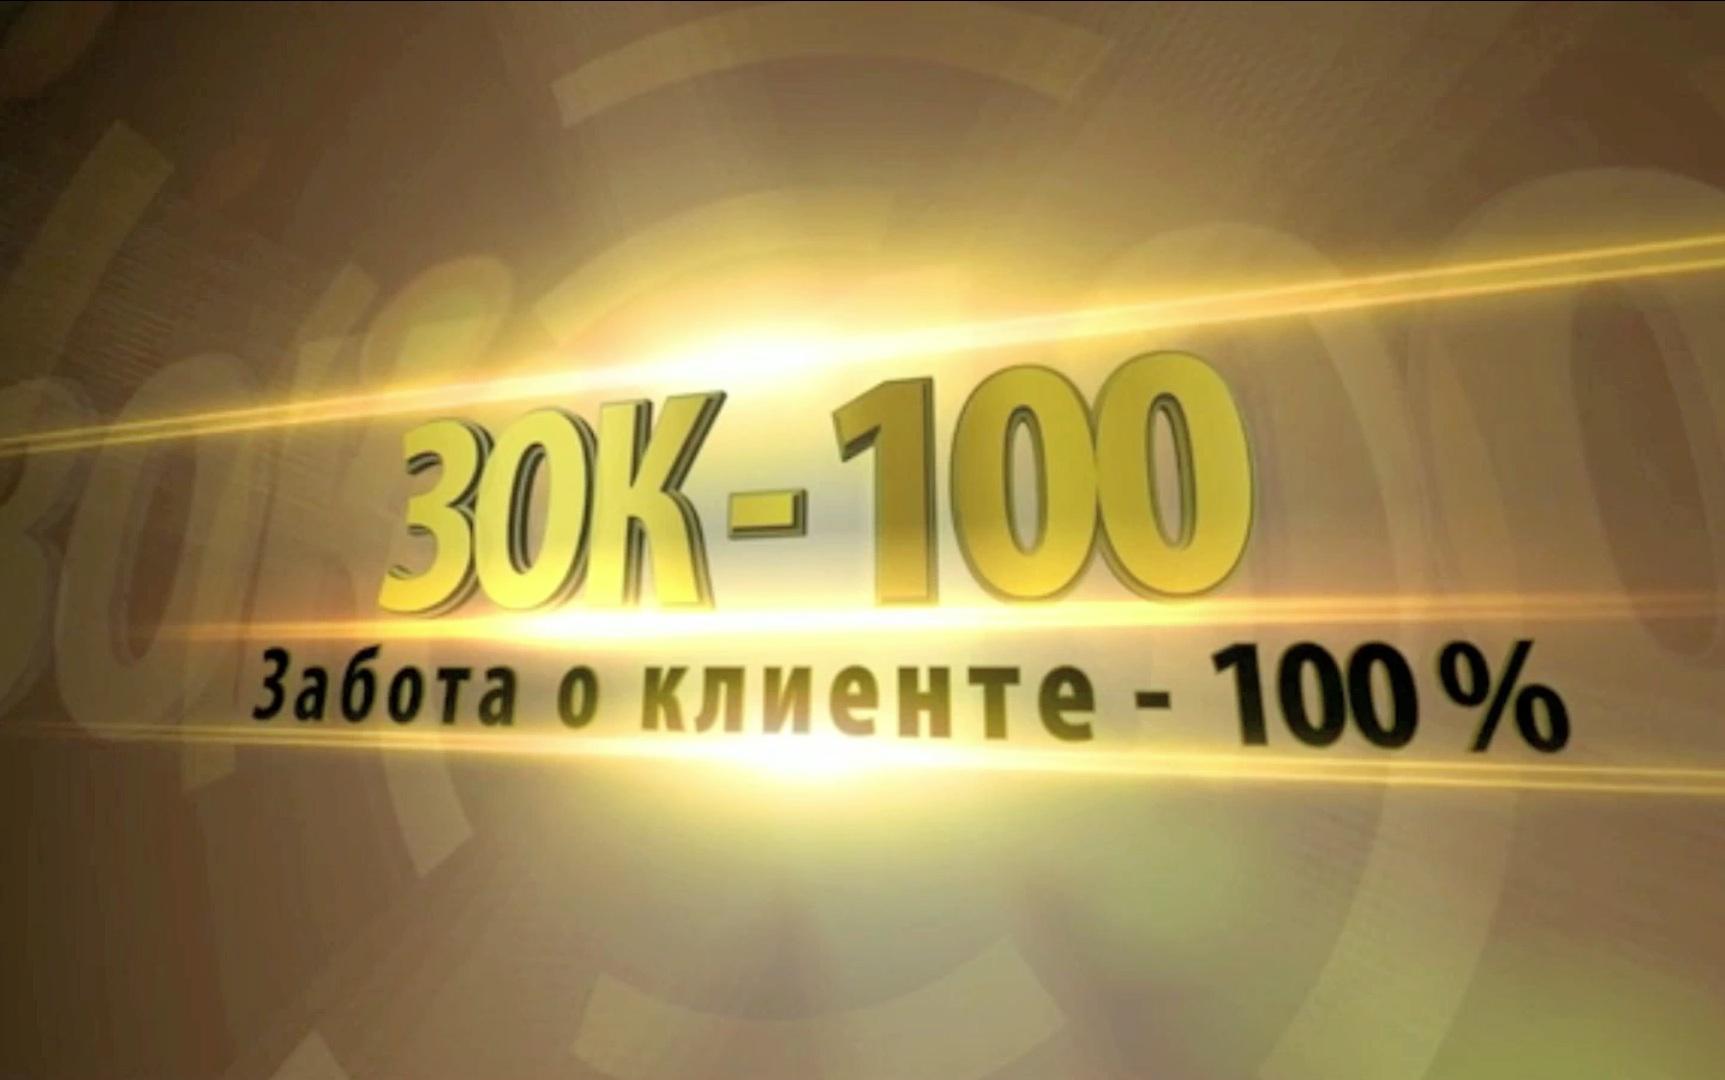 ЗОК100: Забота о клиенте – 100%!